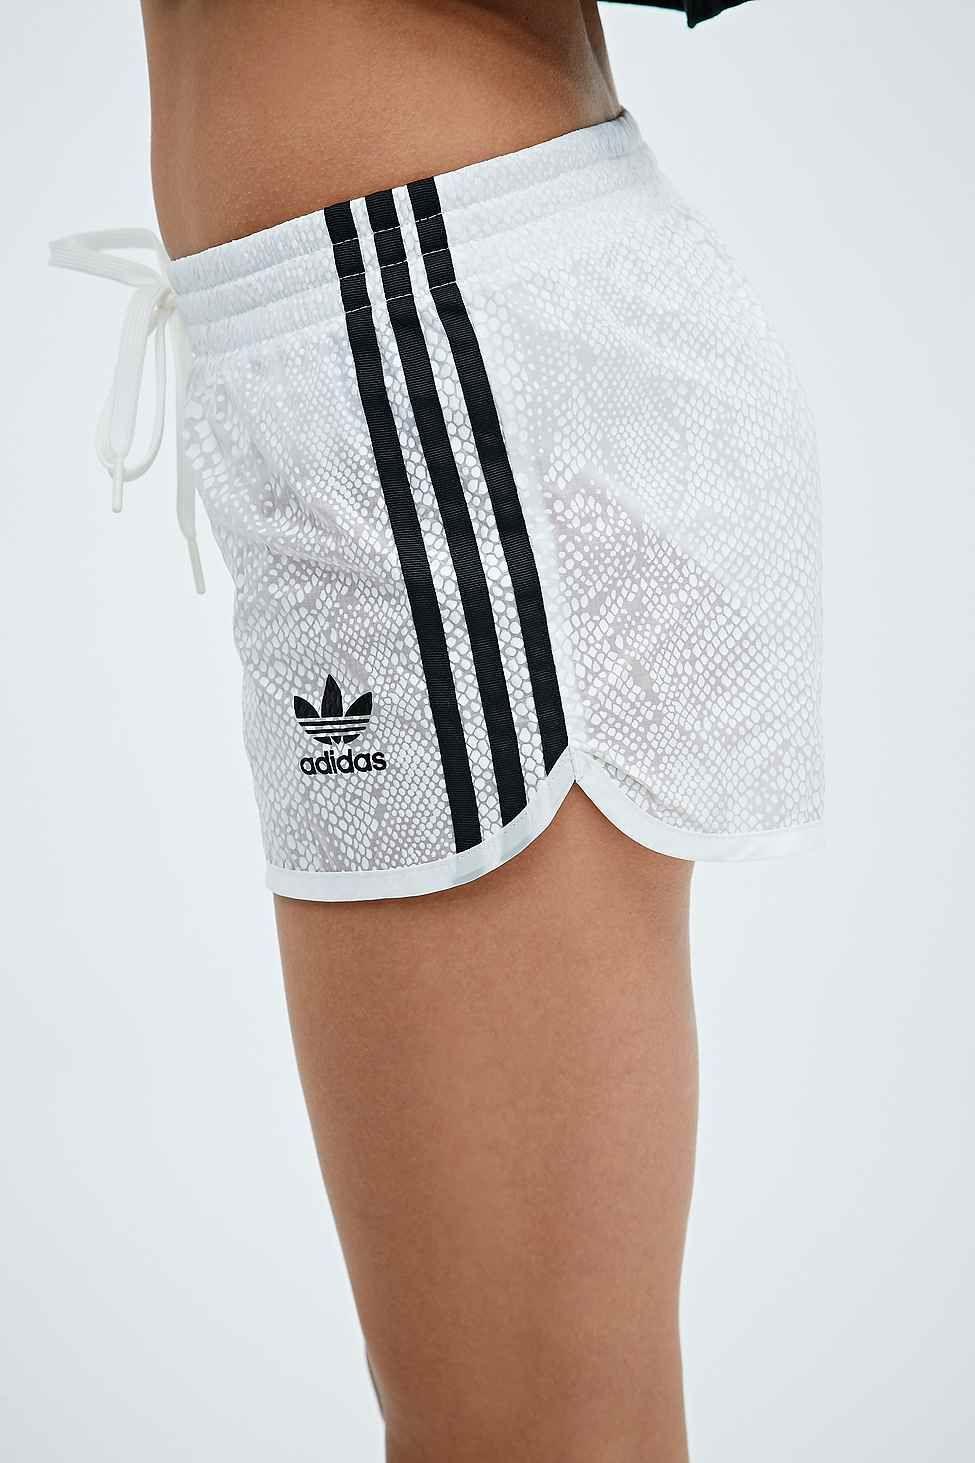 e508dfe342 Adidas Running Shorts in White Más